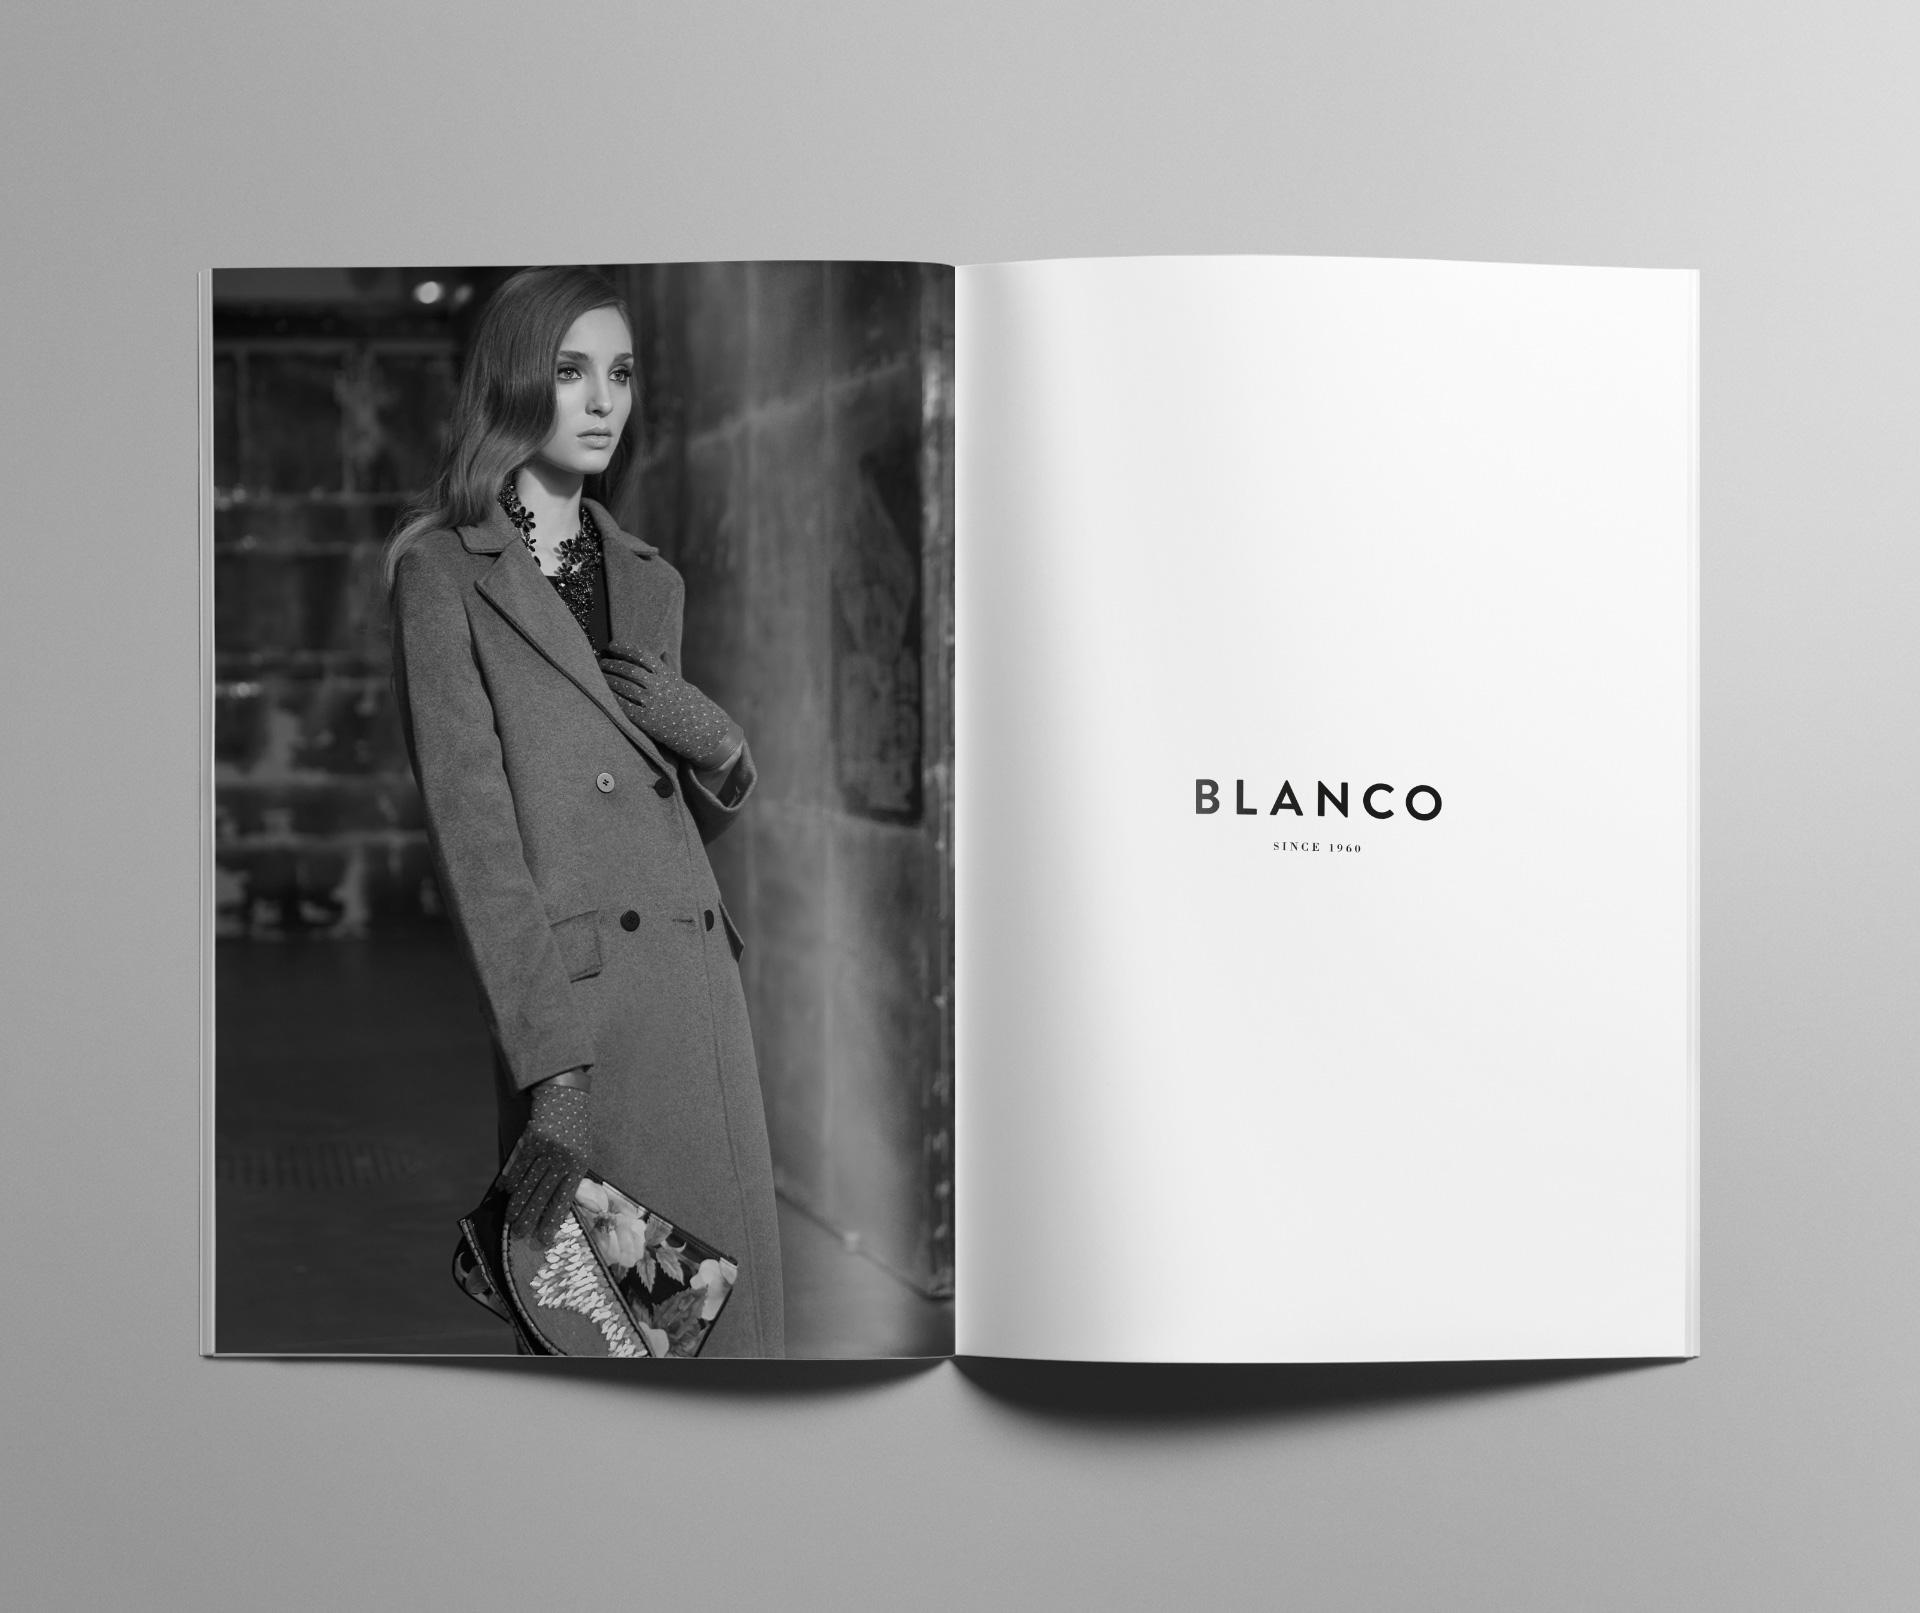 Blanco-New-Brand_03.jpg